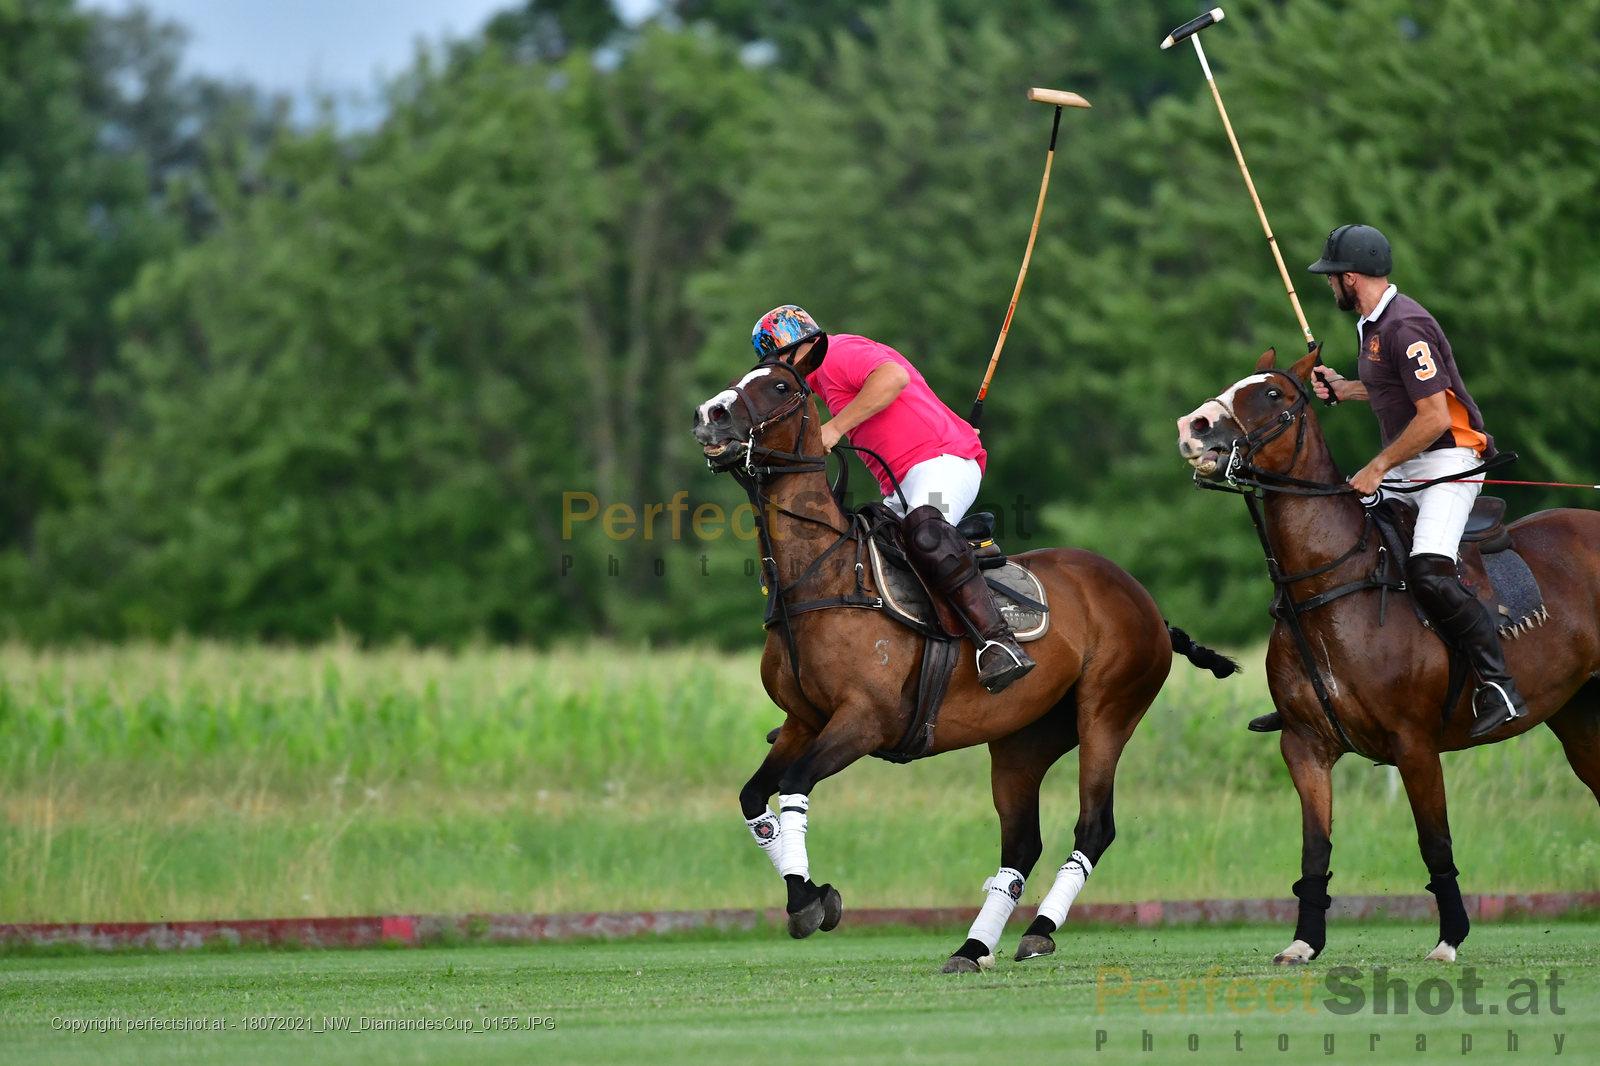 18.06.2021;perfectshot.at;Austria;Polo;2021;Poloclub Niederweiden;Tournament;Day 3;Final;Diamandes;